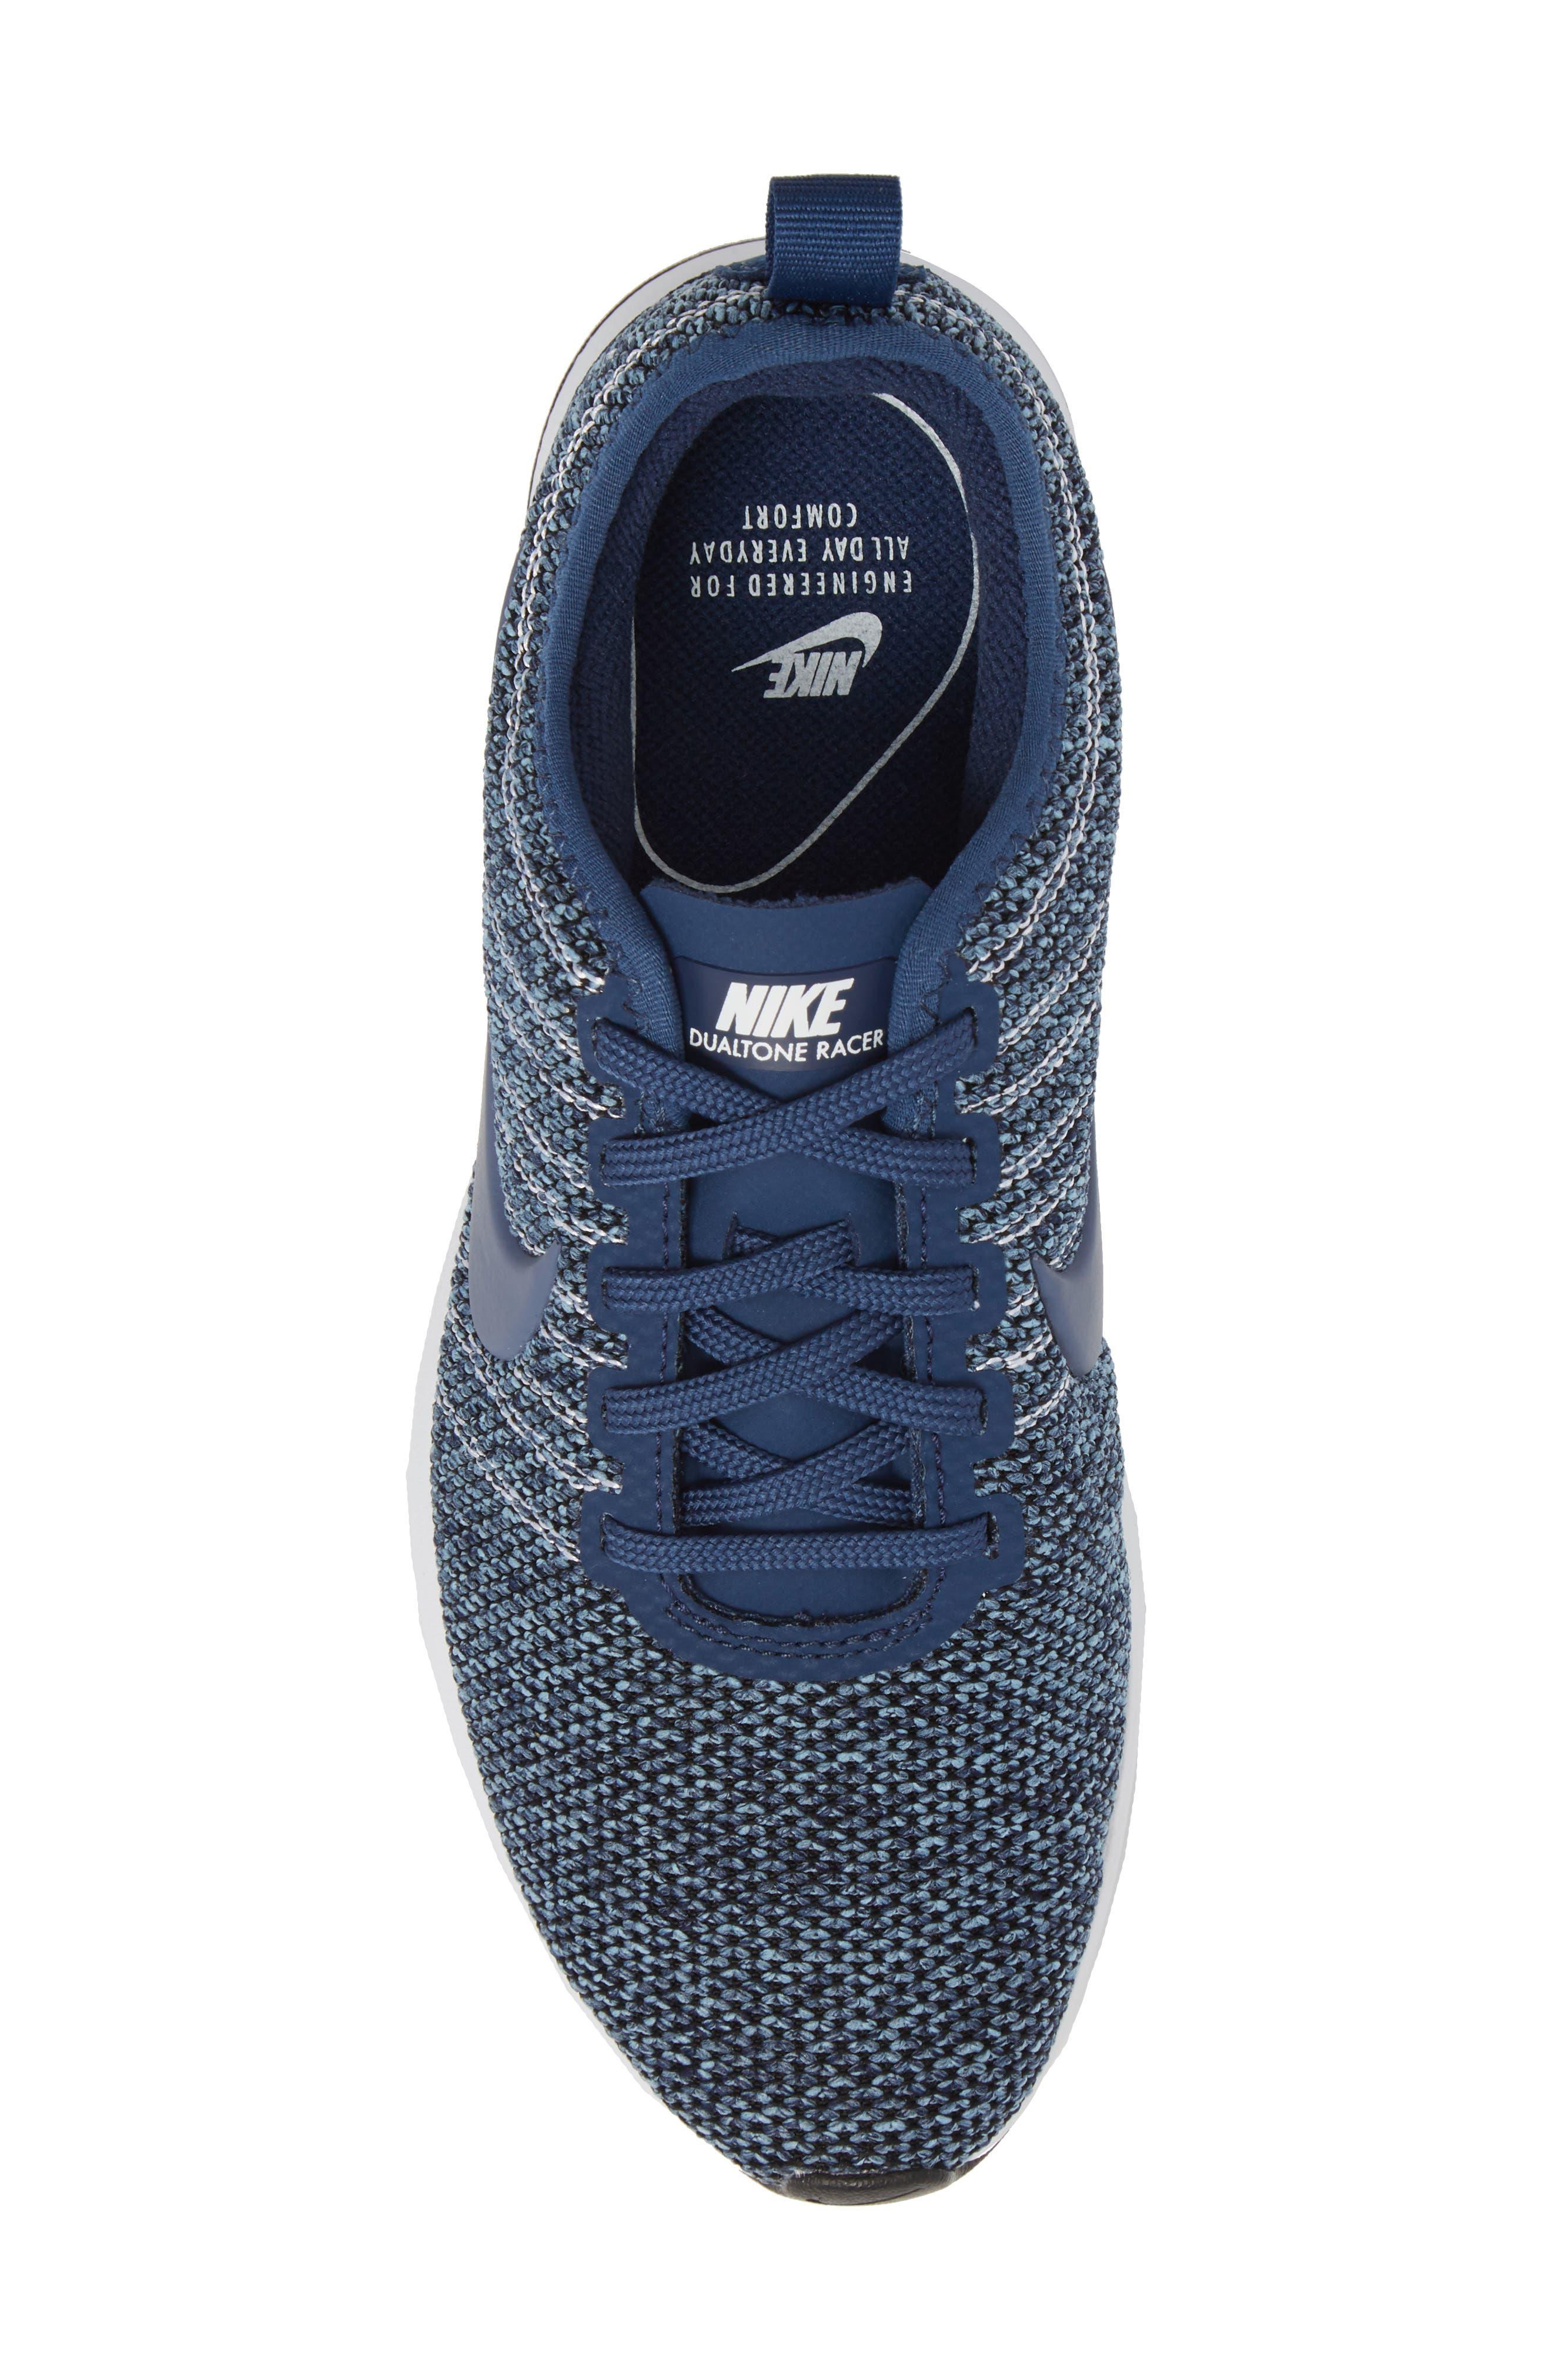 Dualtone Racer PRM Sneaker,                             Alternate thumbnail 5, color,                             Navy/ Diffused Blue